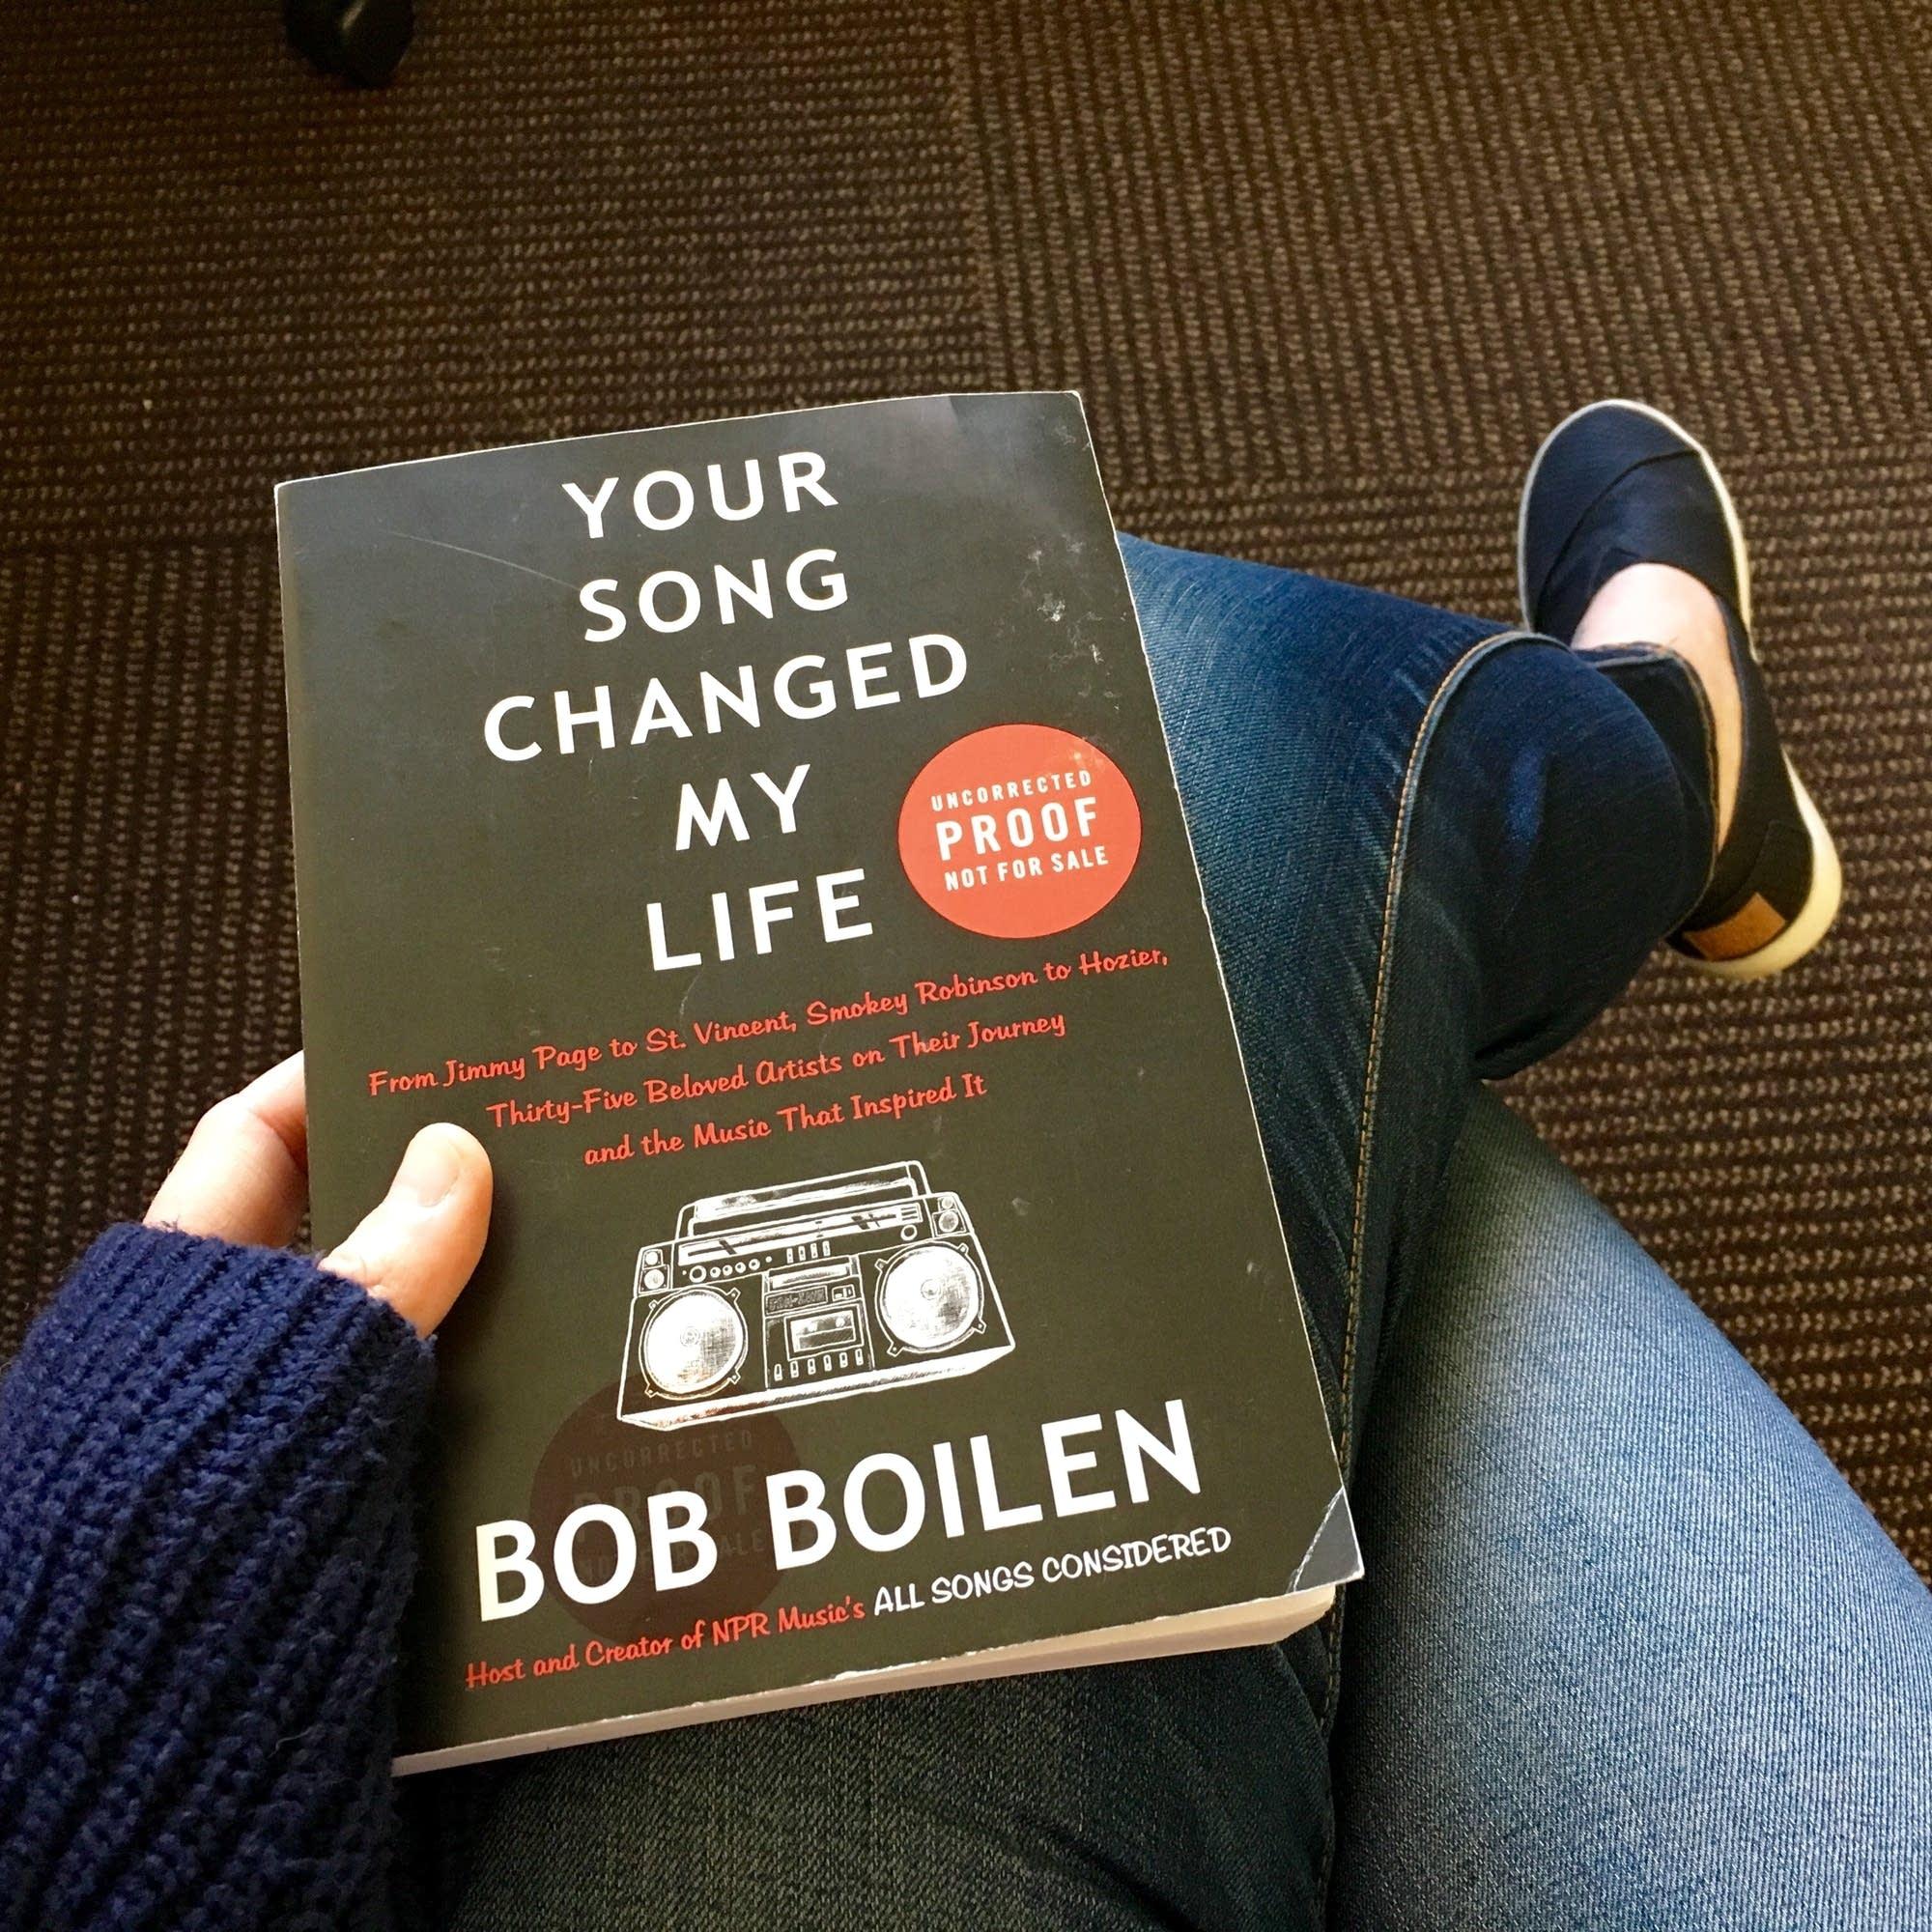 Bob Boilen's